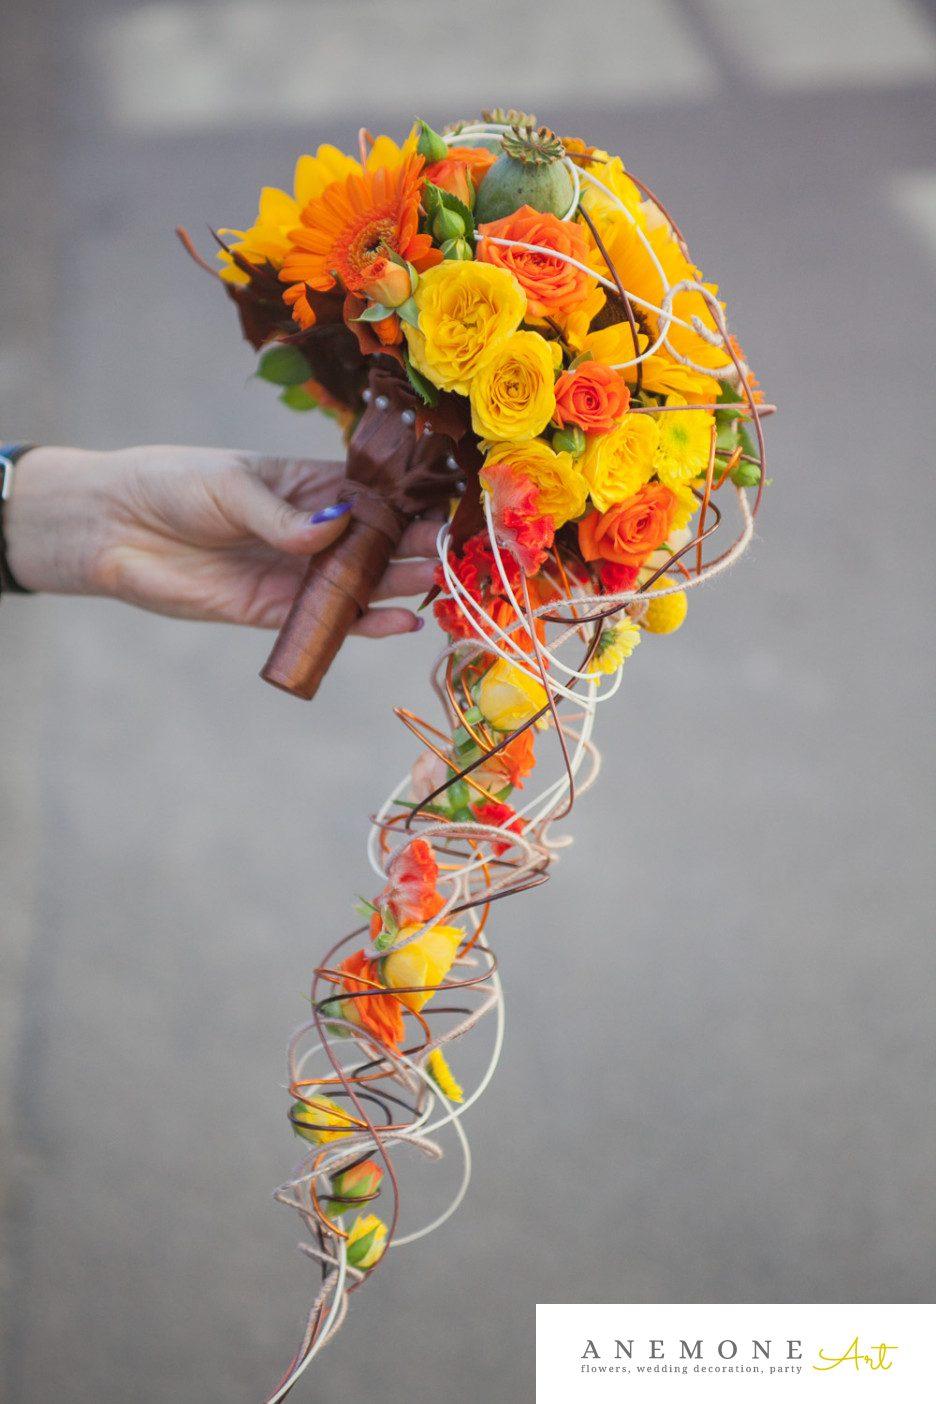 Poza, foto cu Flori de nunta buchet mireasa, curgator, maner buchet in Arad, Timisoara, Oradea (wedding flowers, bouquets) nunta Arad, Timisoara, Oradea